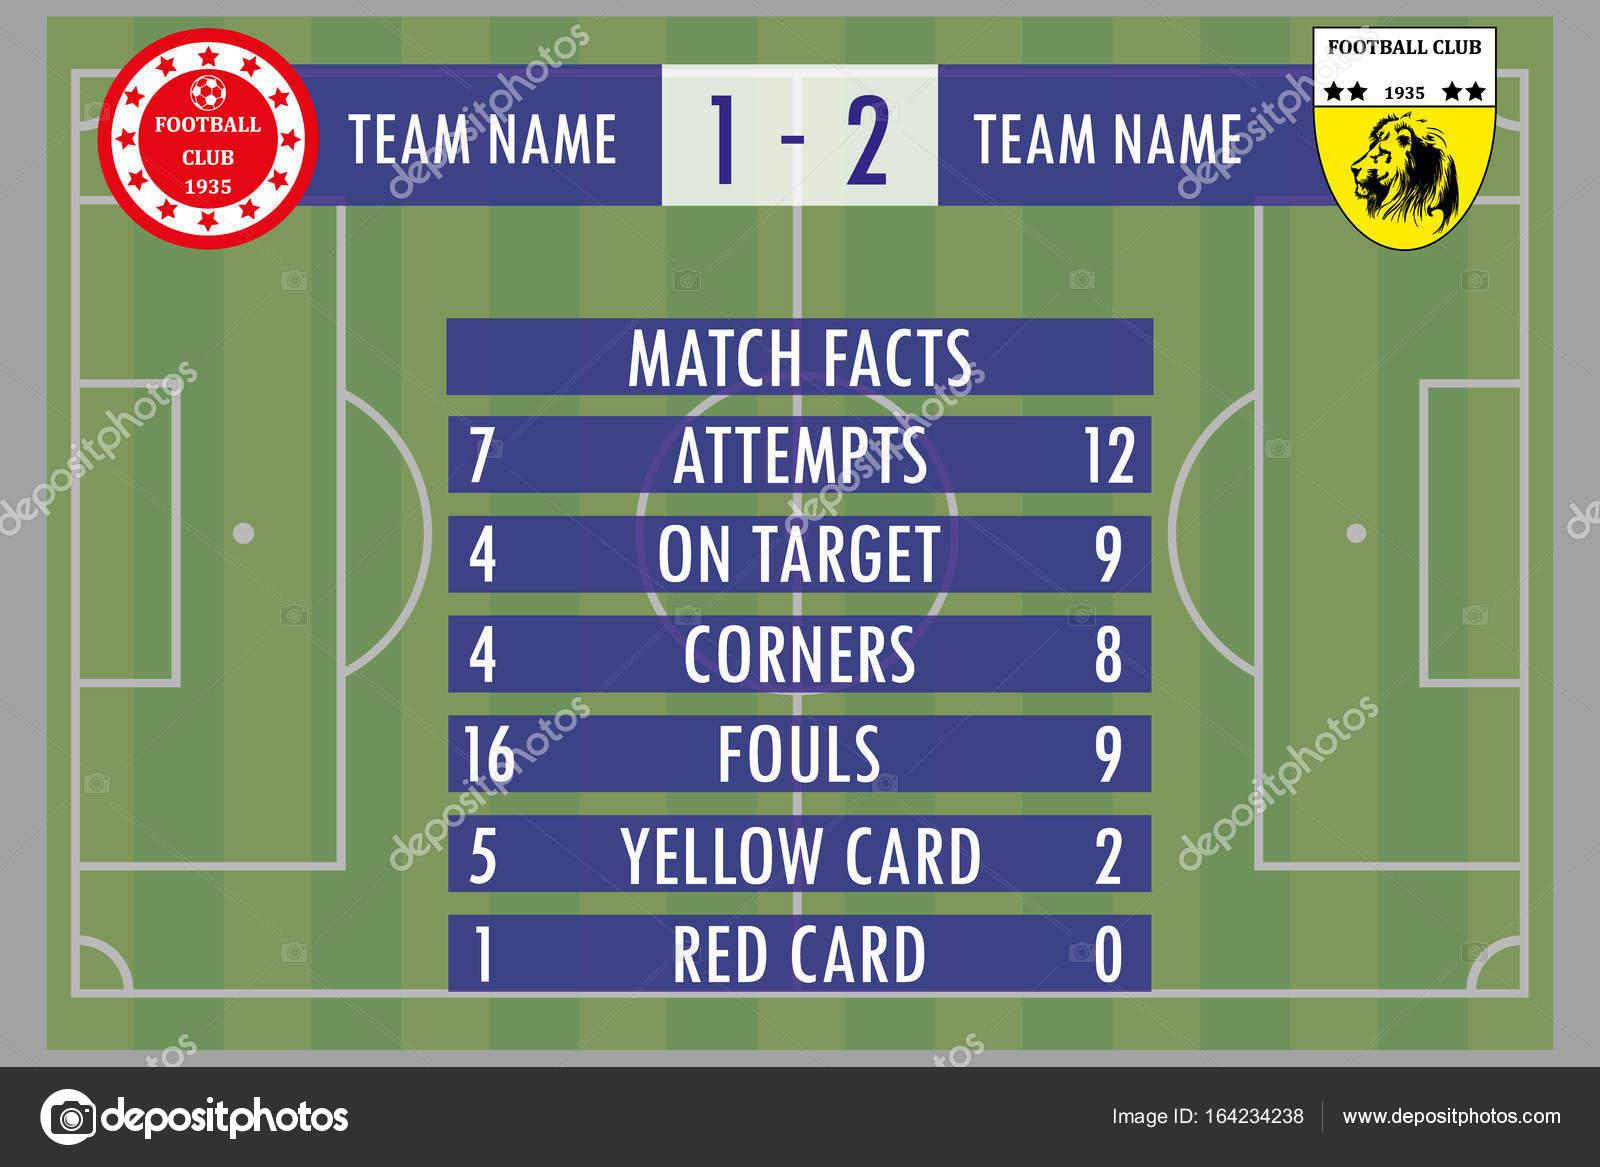 Soccer Football Match Infographic Elements Statistics